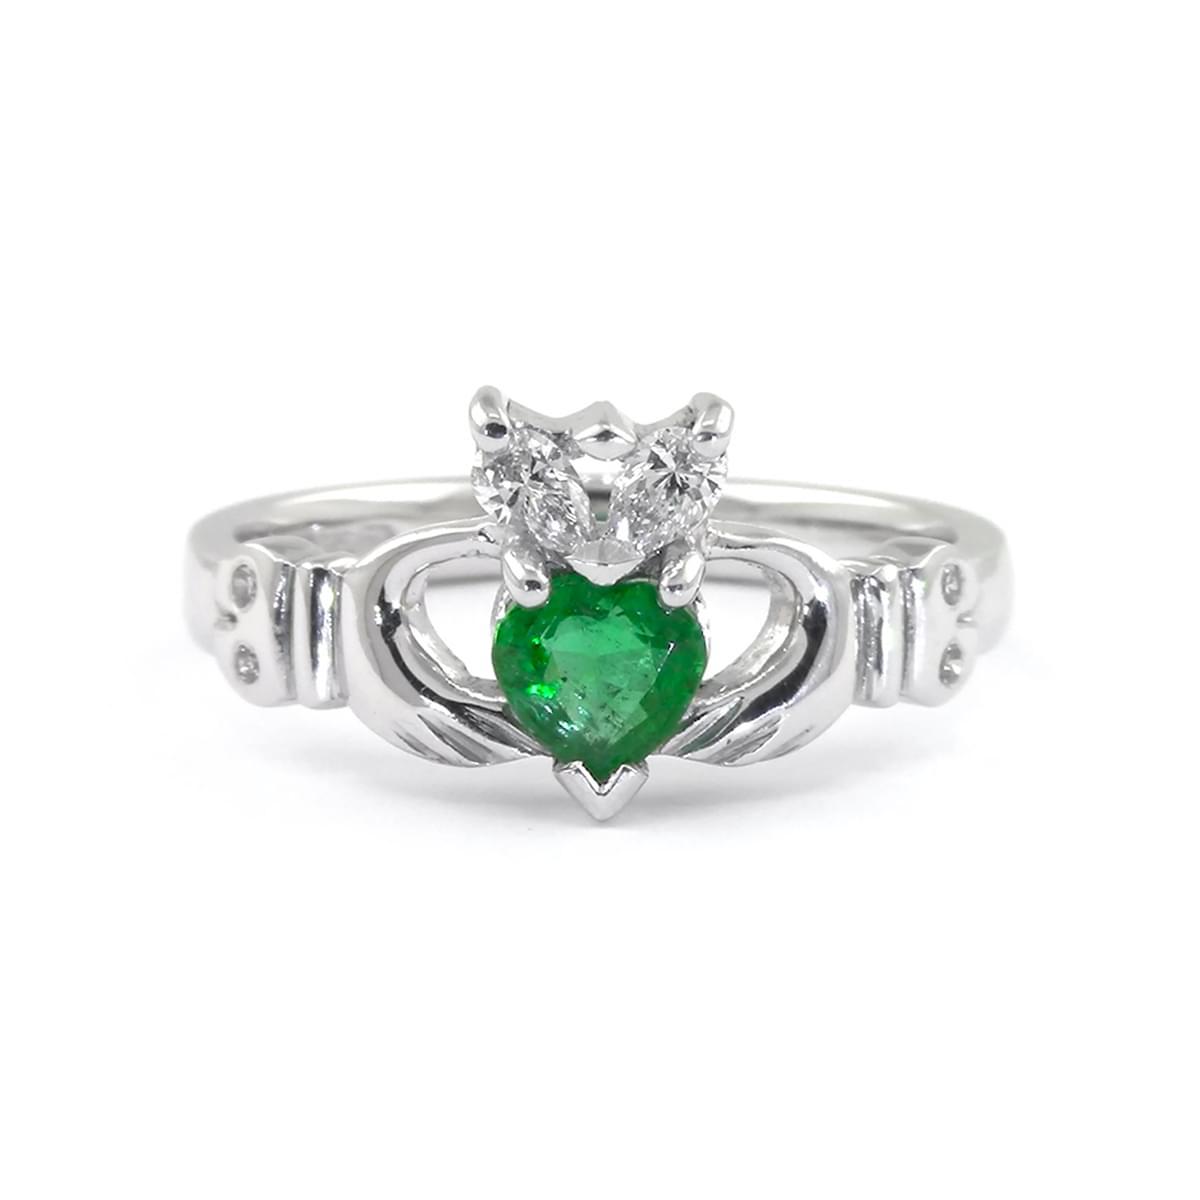 White Gold Heartshape Emerald & Diamond Claddagh Engagement Ring